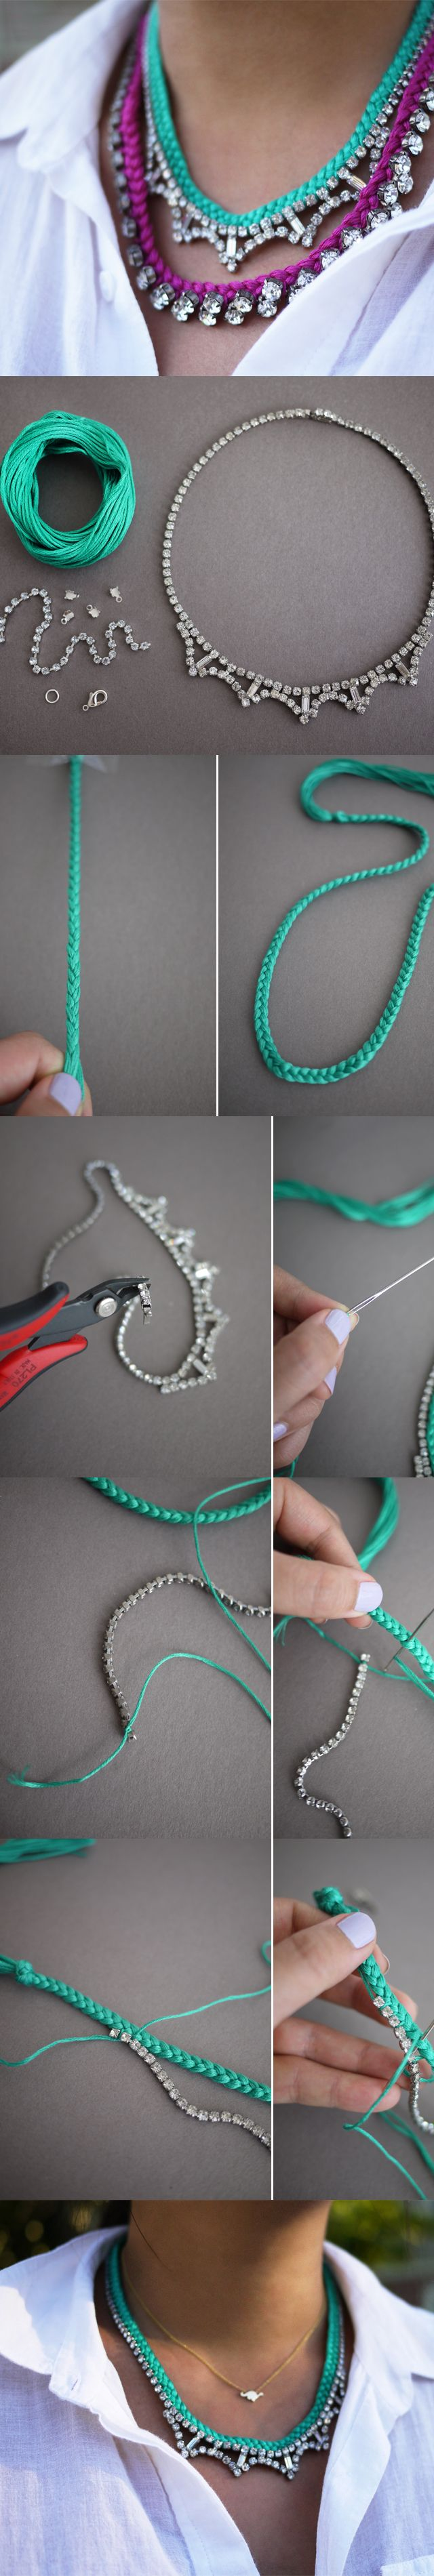 DIY Faire des colliers. (http://www.prettydesigns.com/17-useful-pretty-diy-ideas-necklace/)